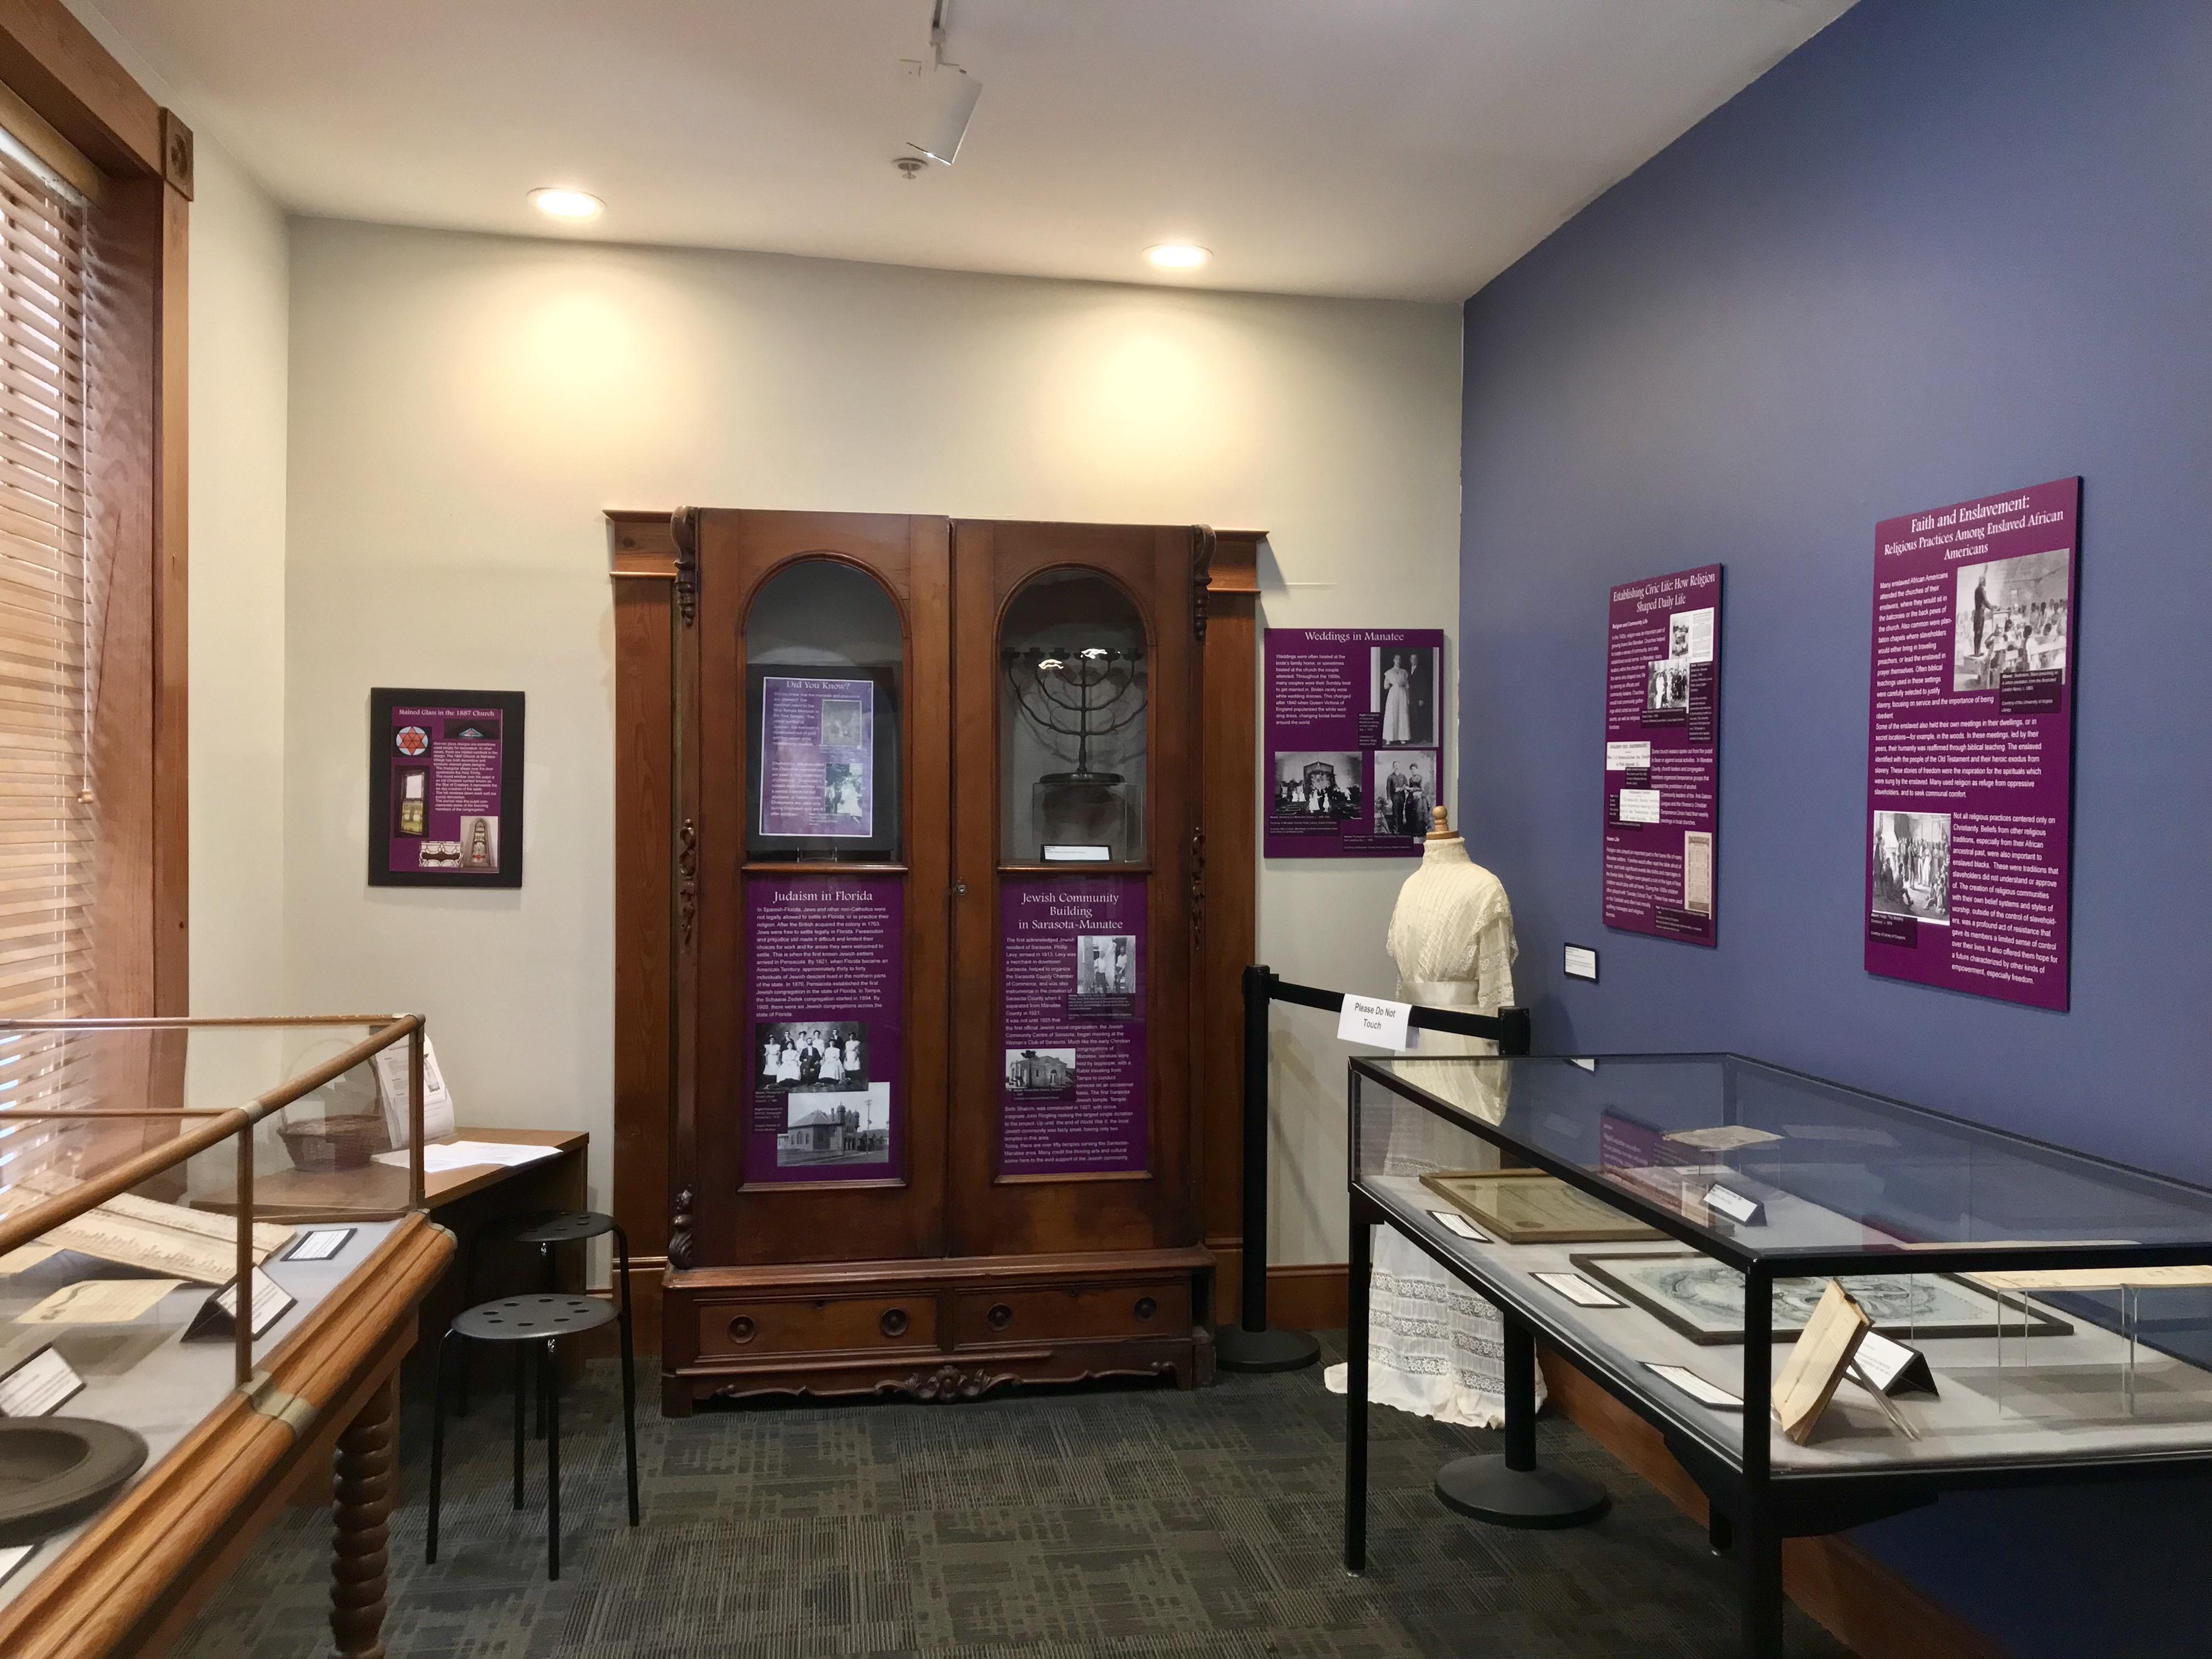 Religion in Manatee Exhibit (2019-2020)